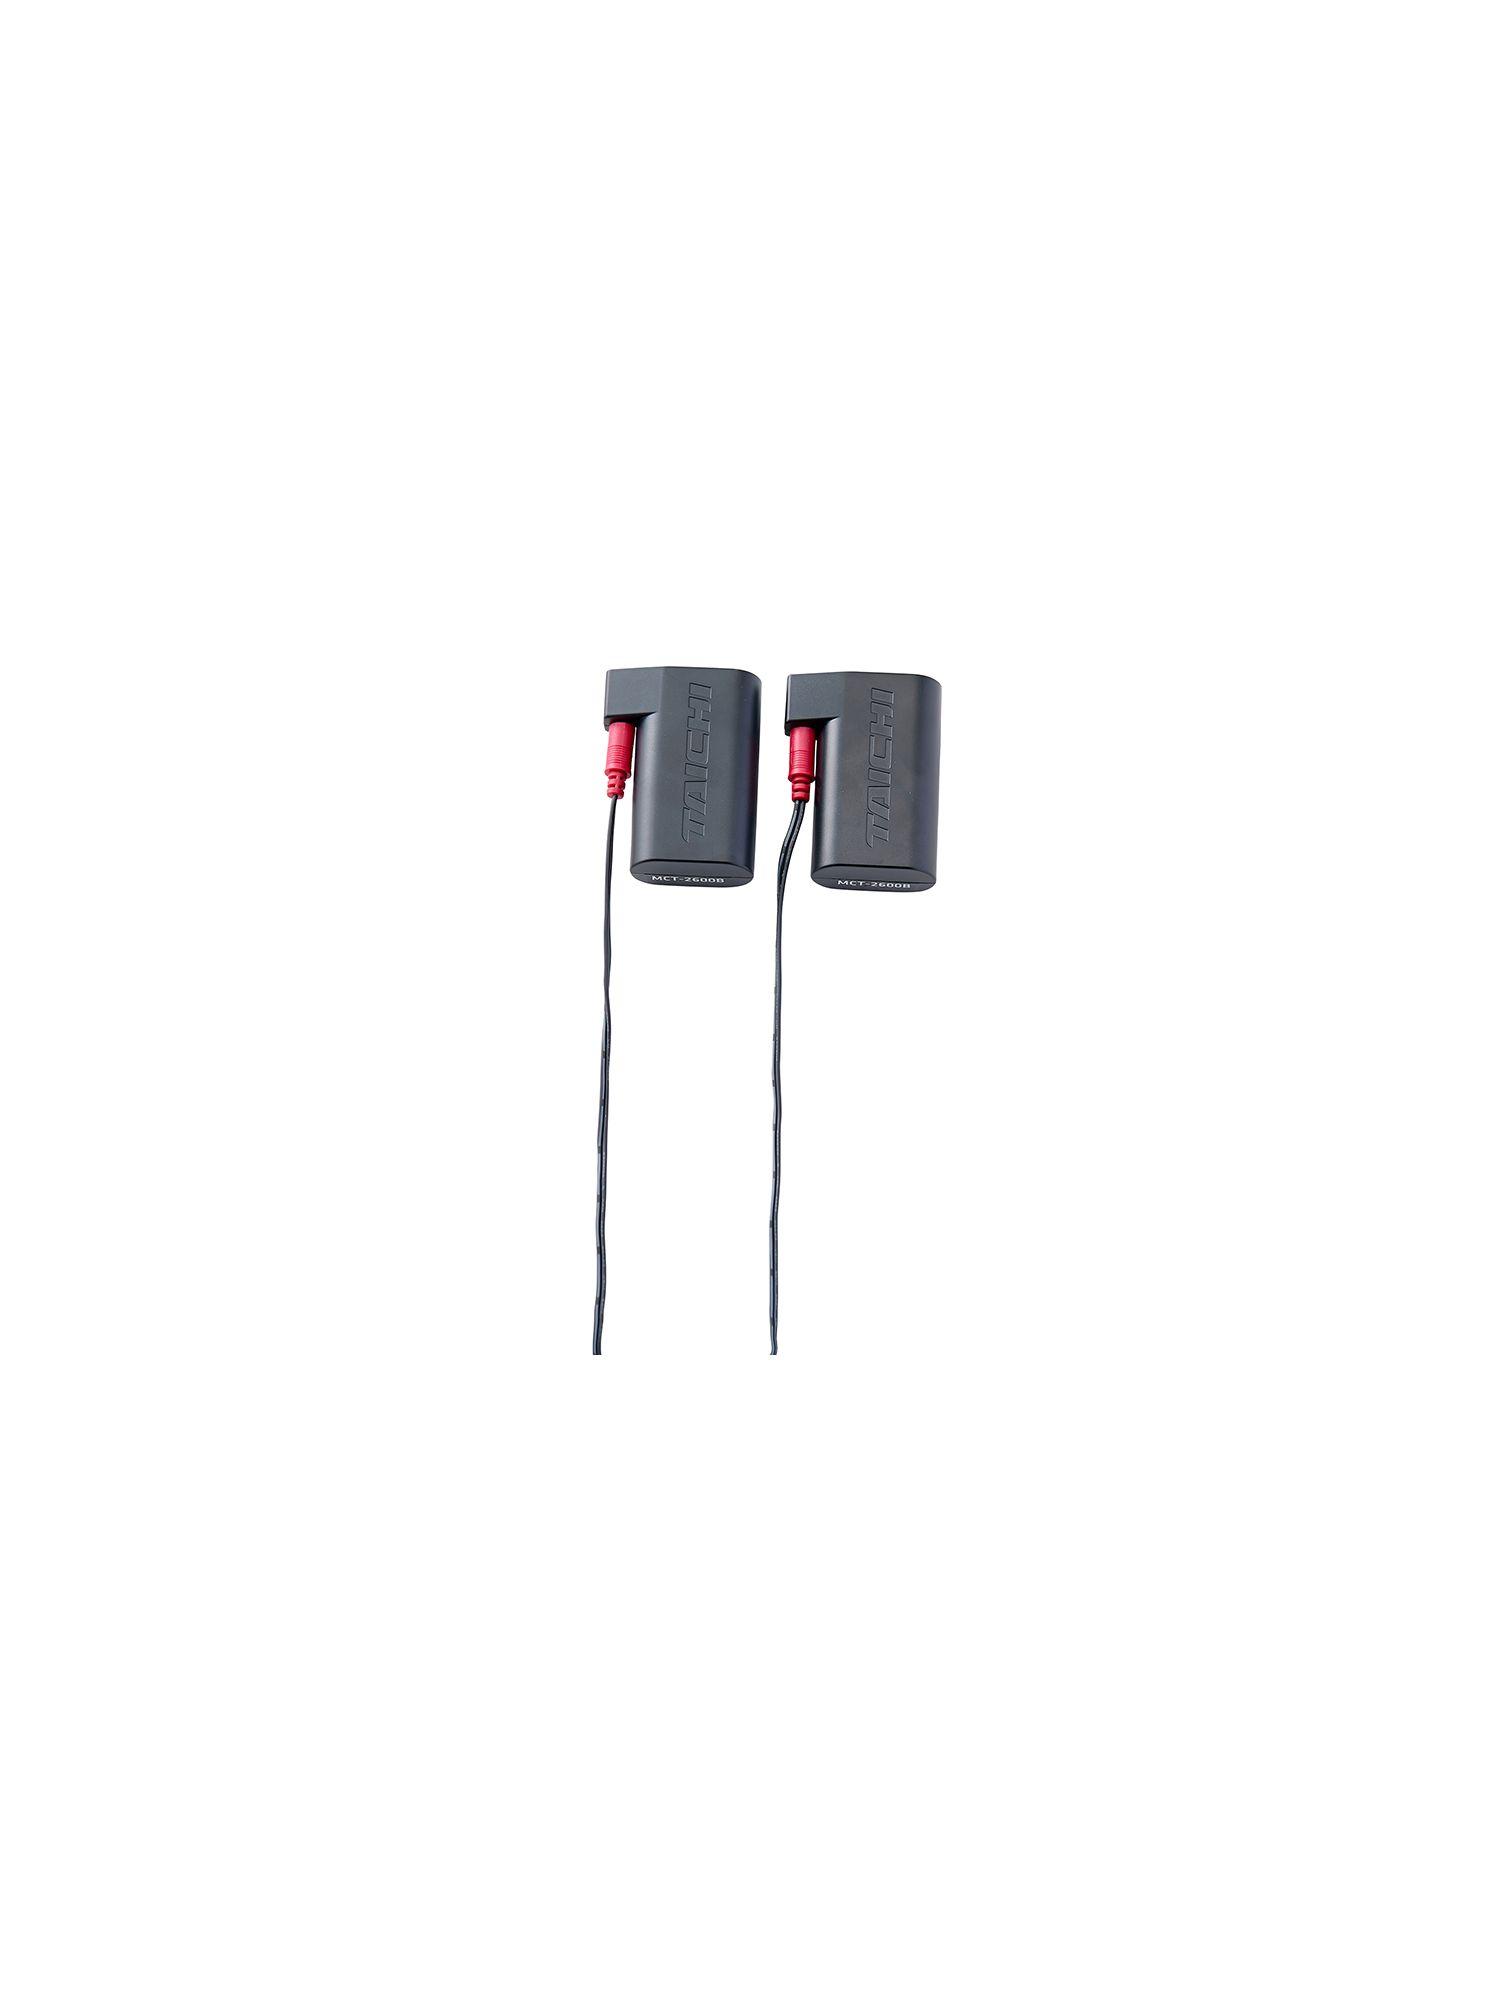 RSP042 e-HEAT 7.2V充電器&バッテリーセット